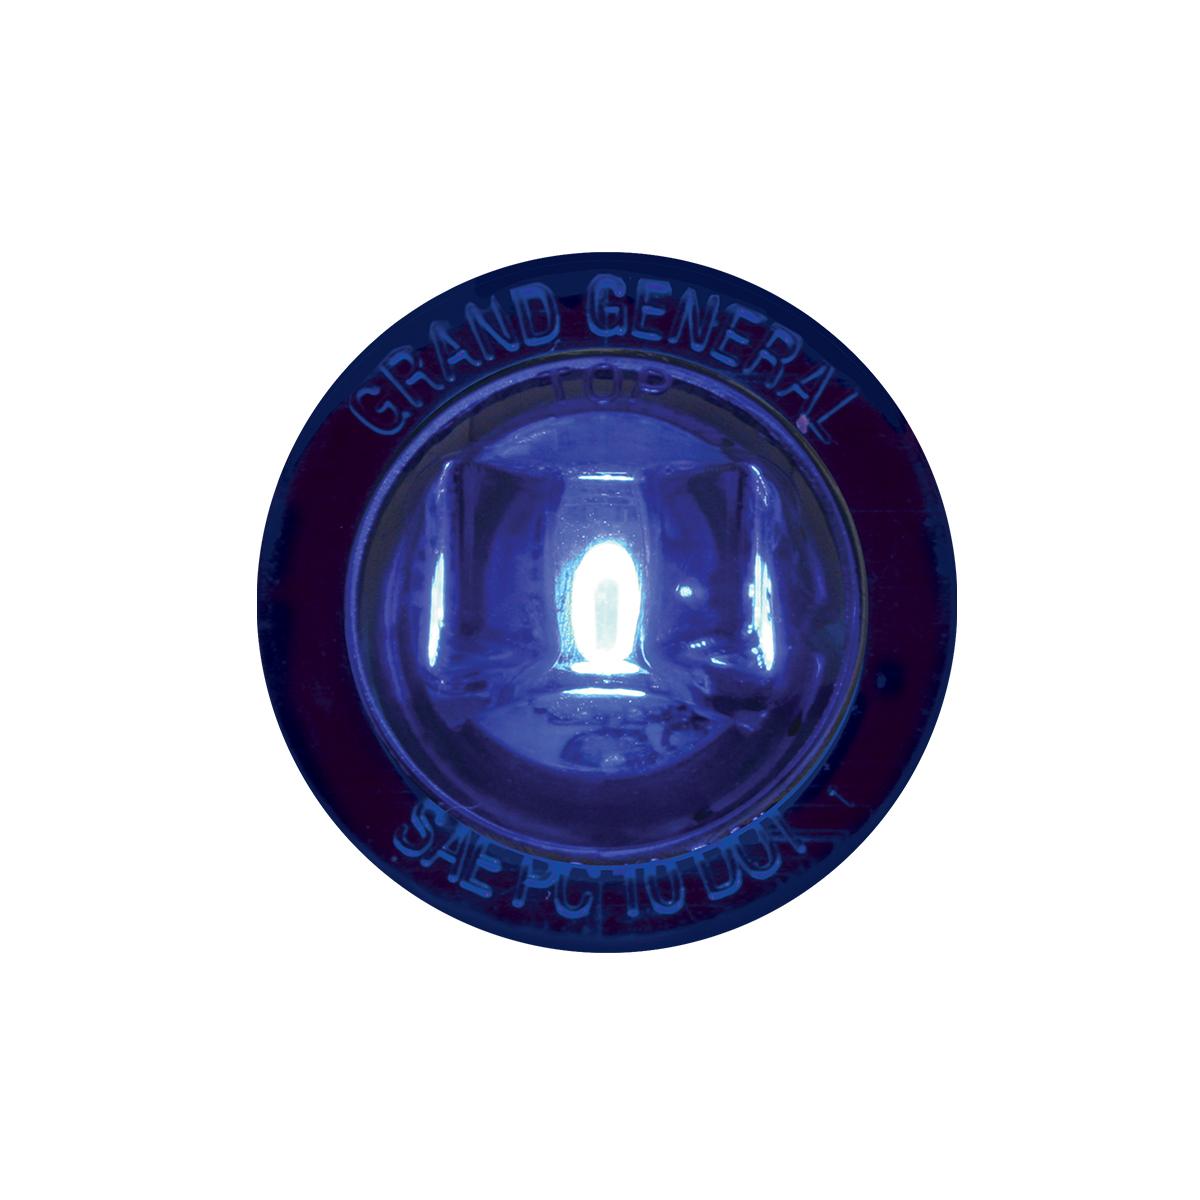 "87285 1"" Mini Push/Screw-in Wide Angle LED Light"